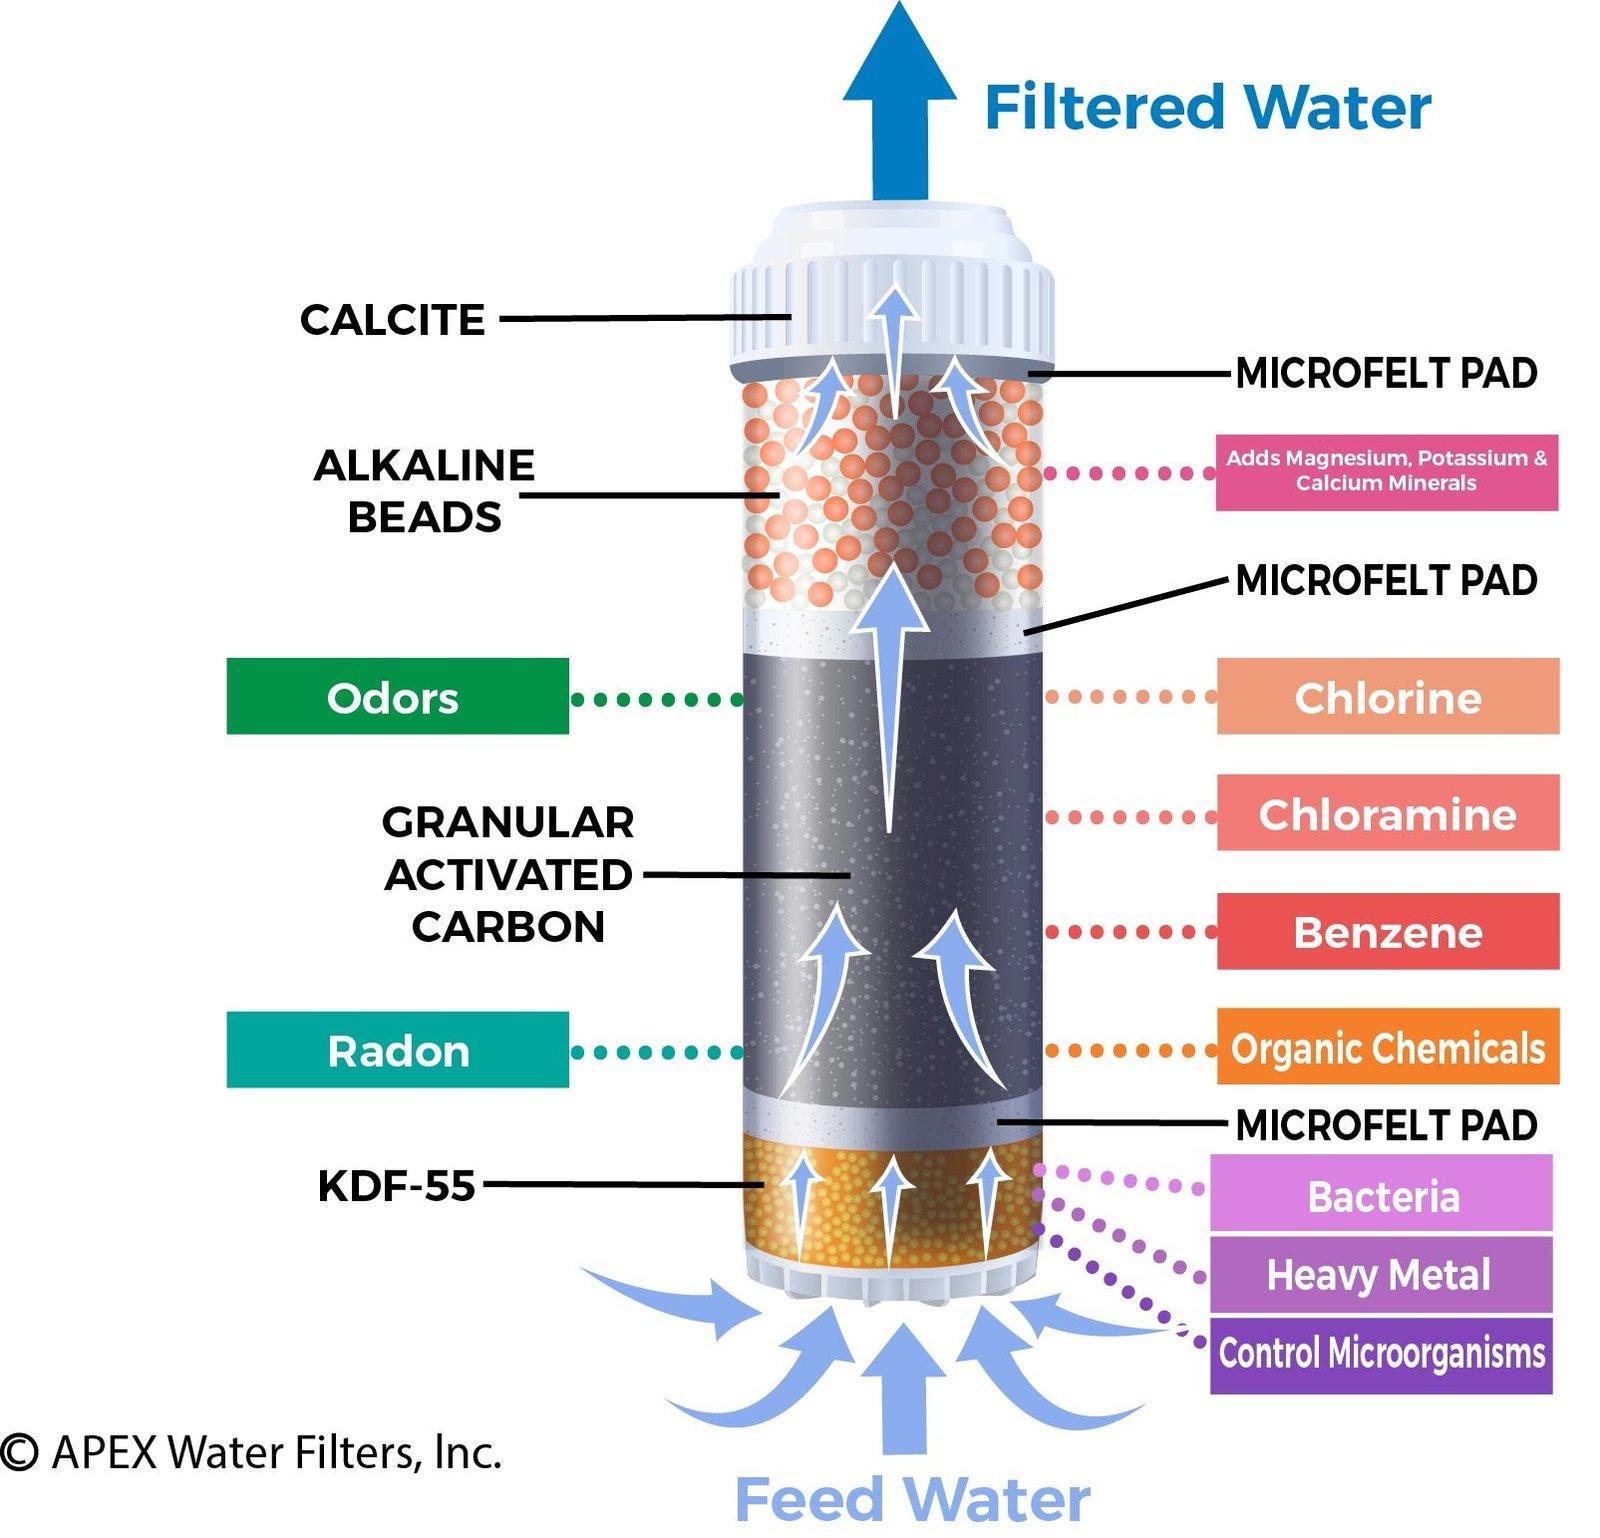 Countertop Alkaline Water Filter : Countertop Drinking Water Filter - Alkaline (Green) - Kitchen, Dining ...